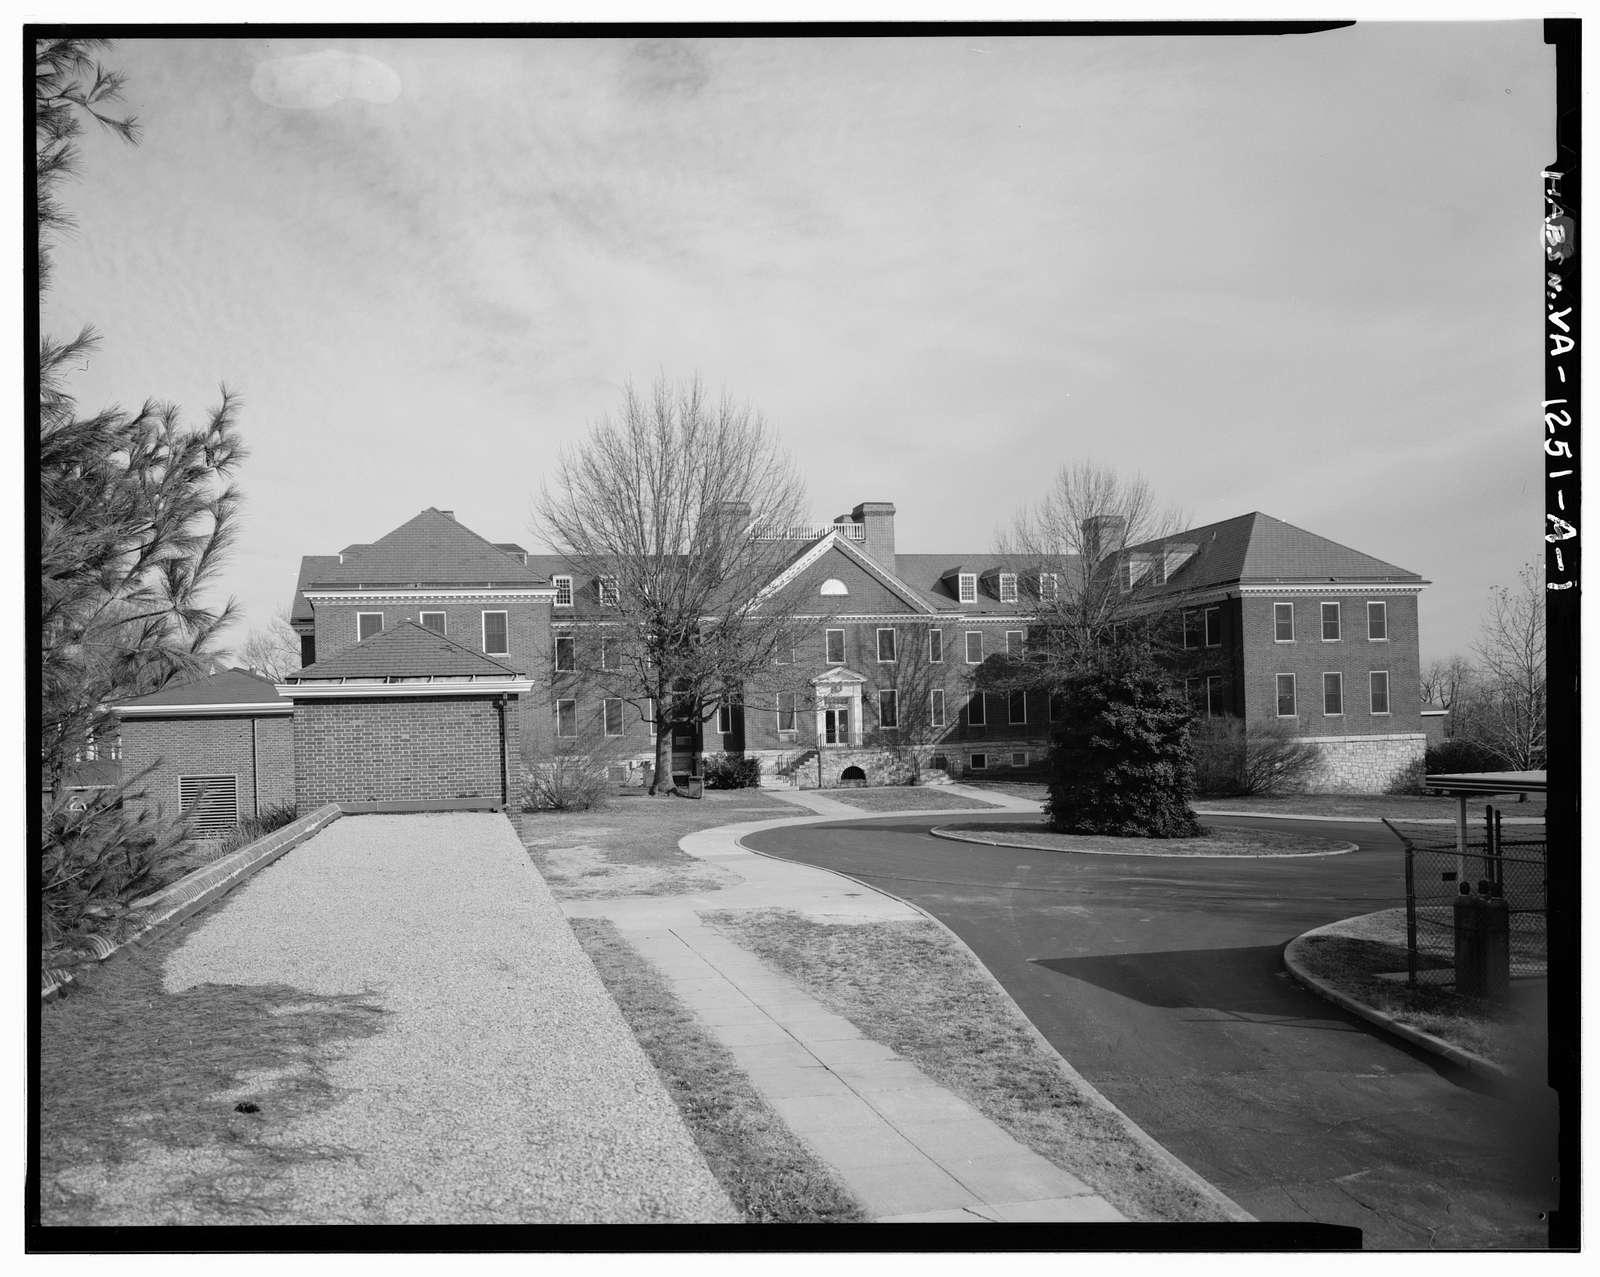 Roanoke Veterans Administration Hospital, Building No. 6, 1970 Roanoke Boulevard, Salem, Salem, VA